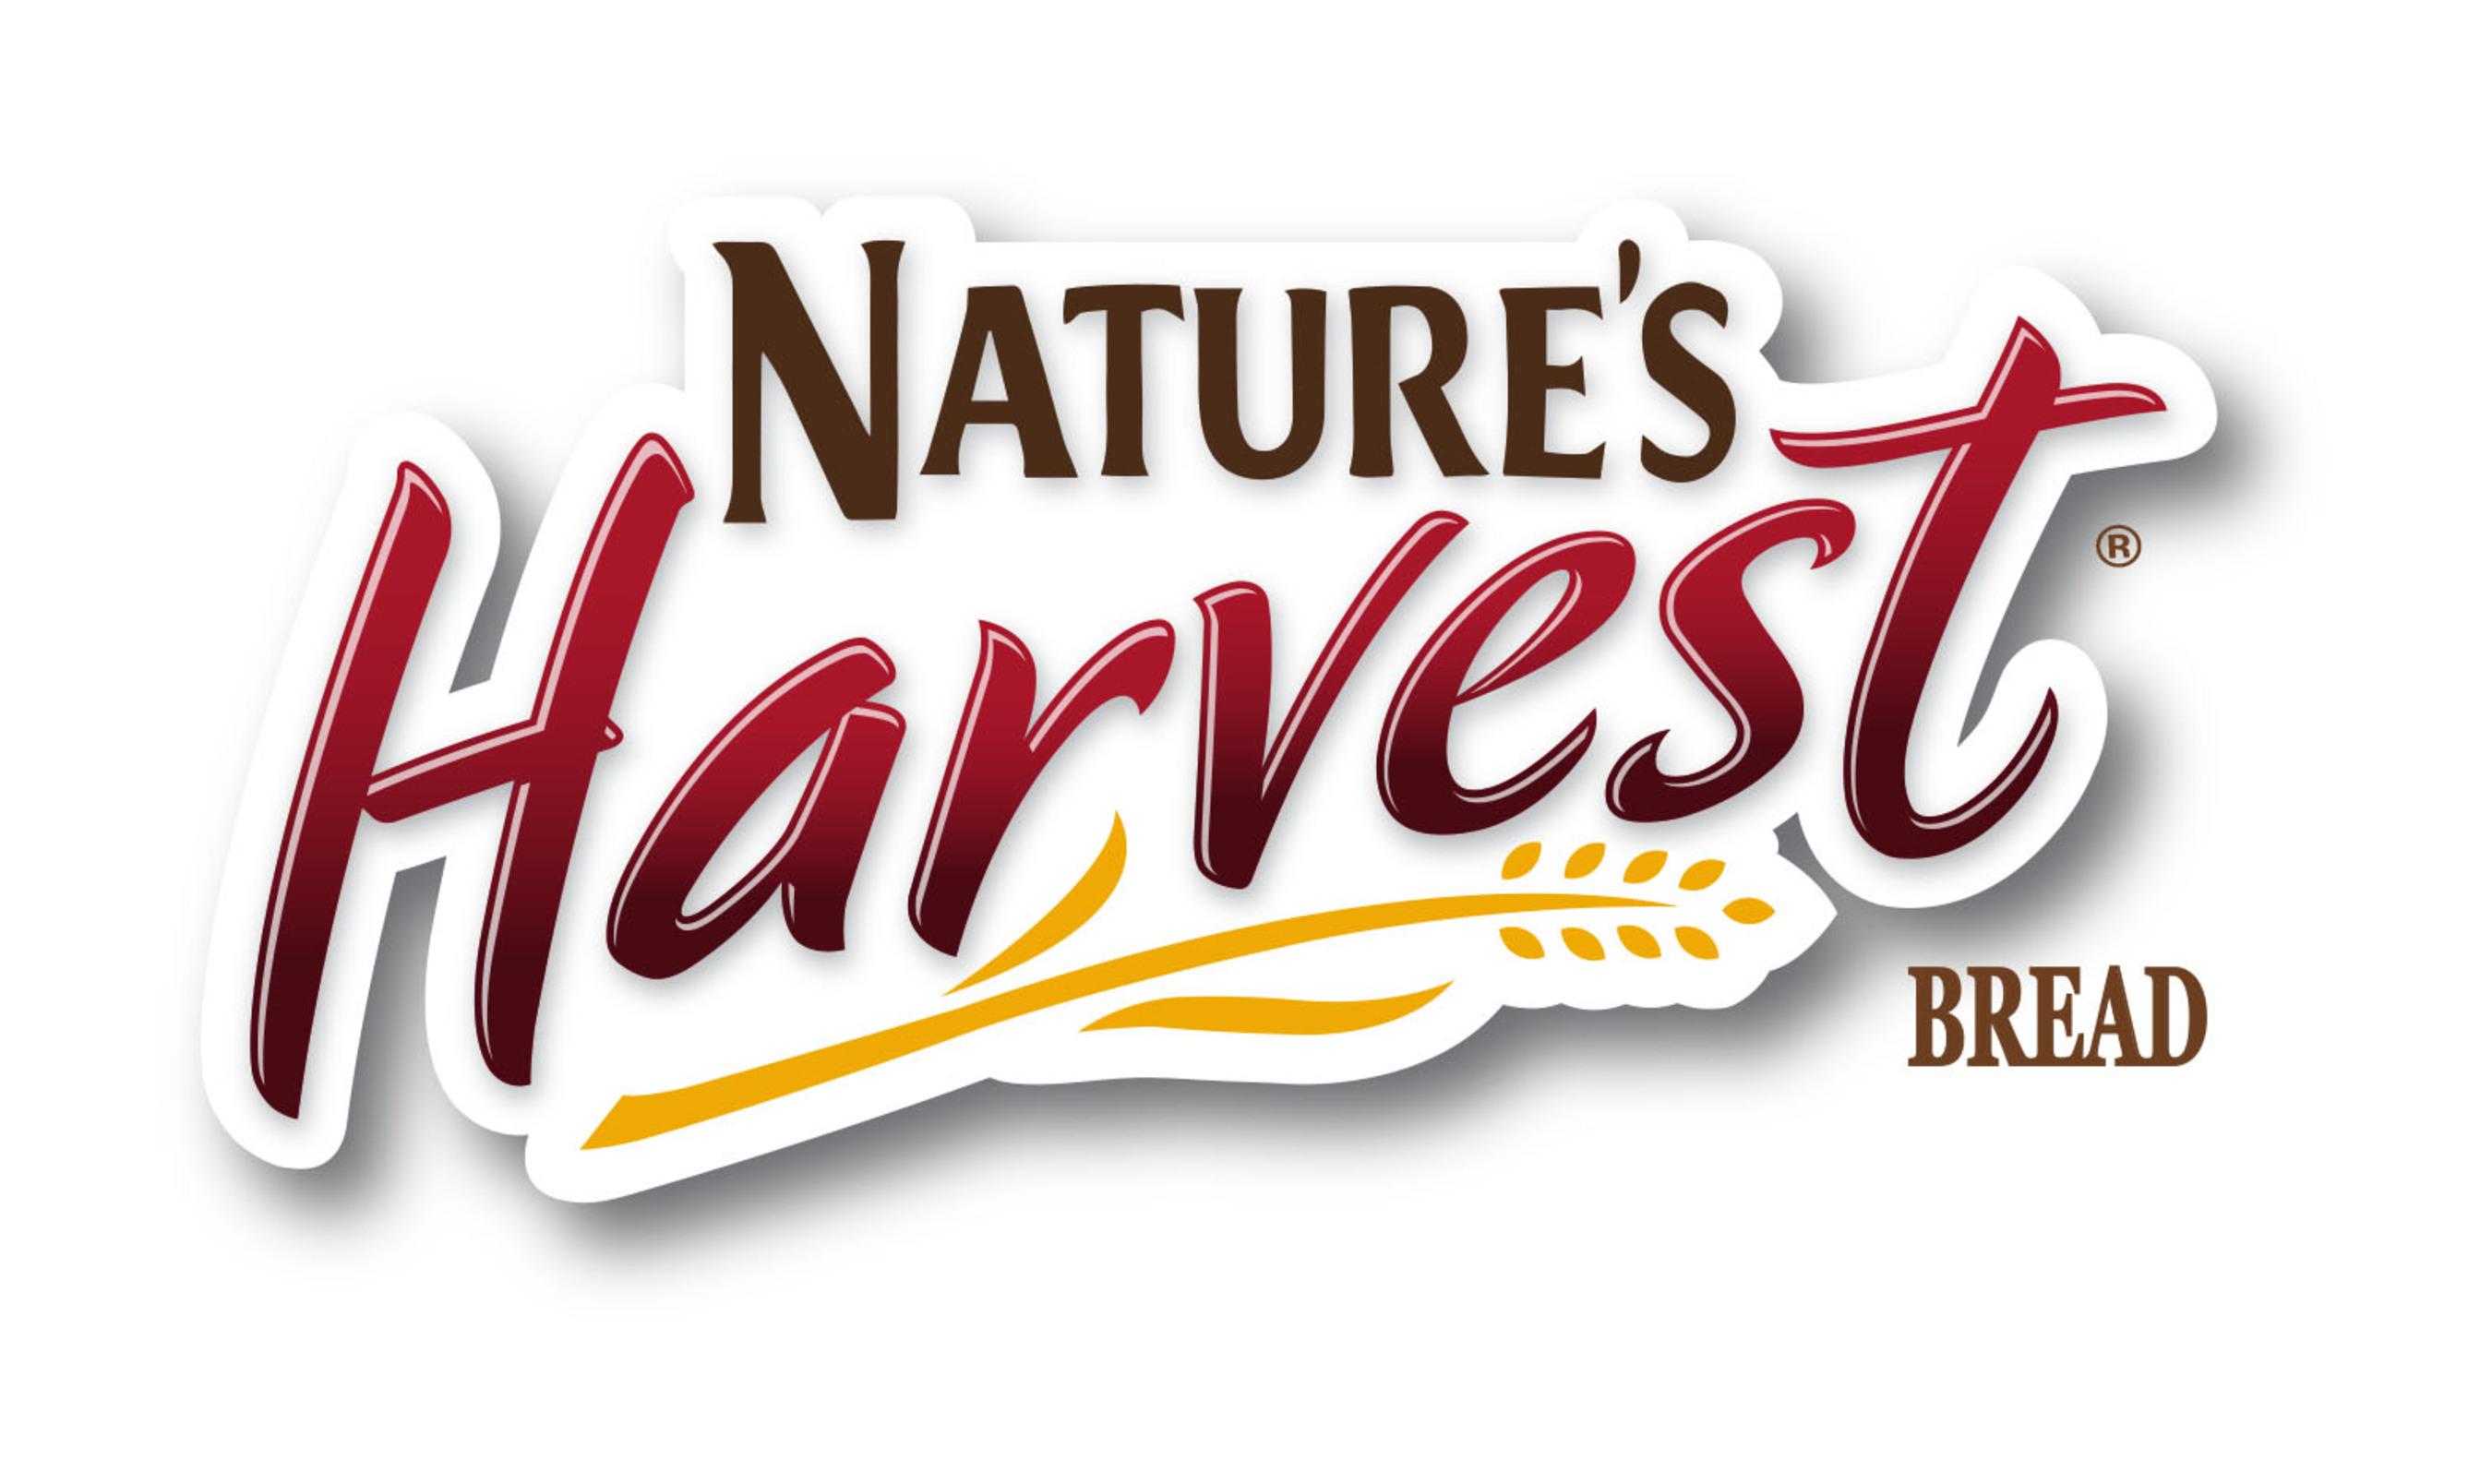 9ebcbe8e7e4 Nature s Harvest® Bread Celebrates Disney•Pixar s